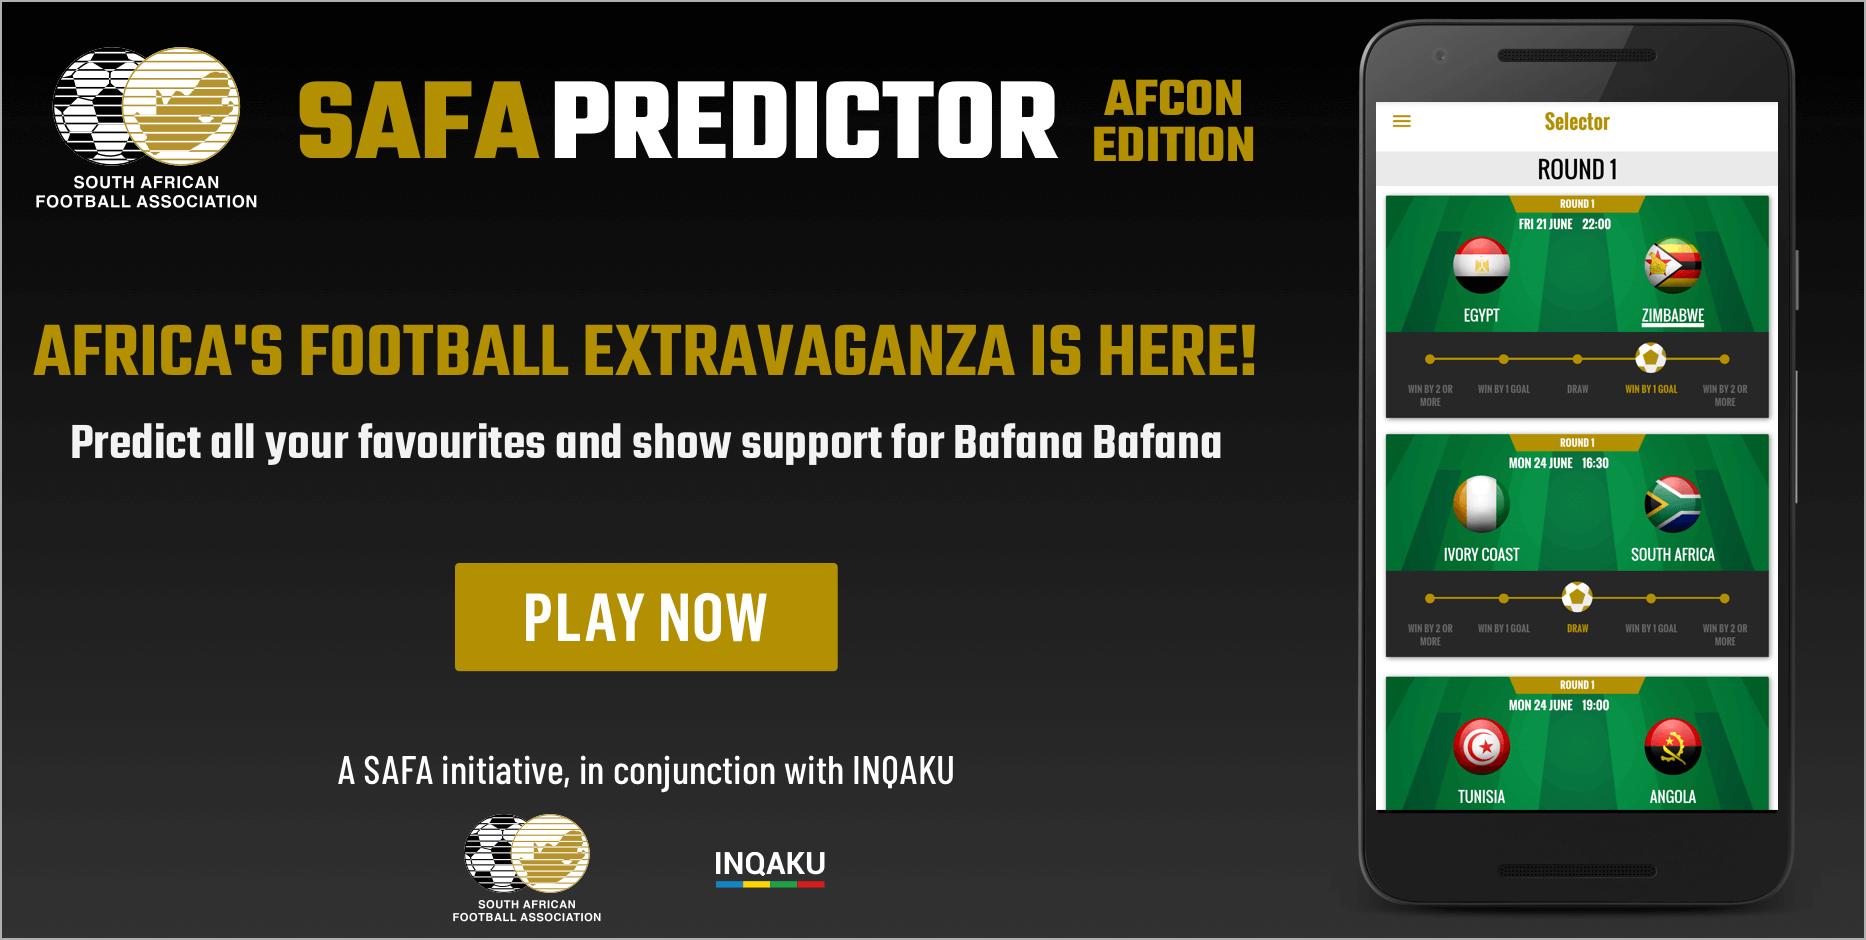 SAFA Predictor  - AFCON Edition